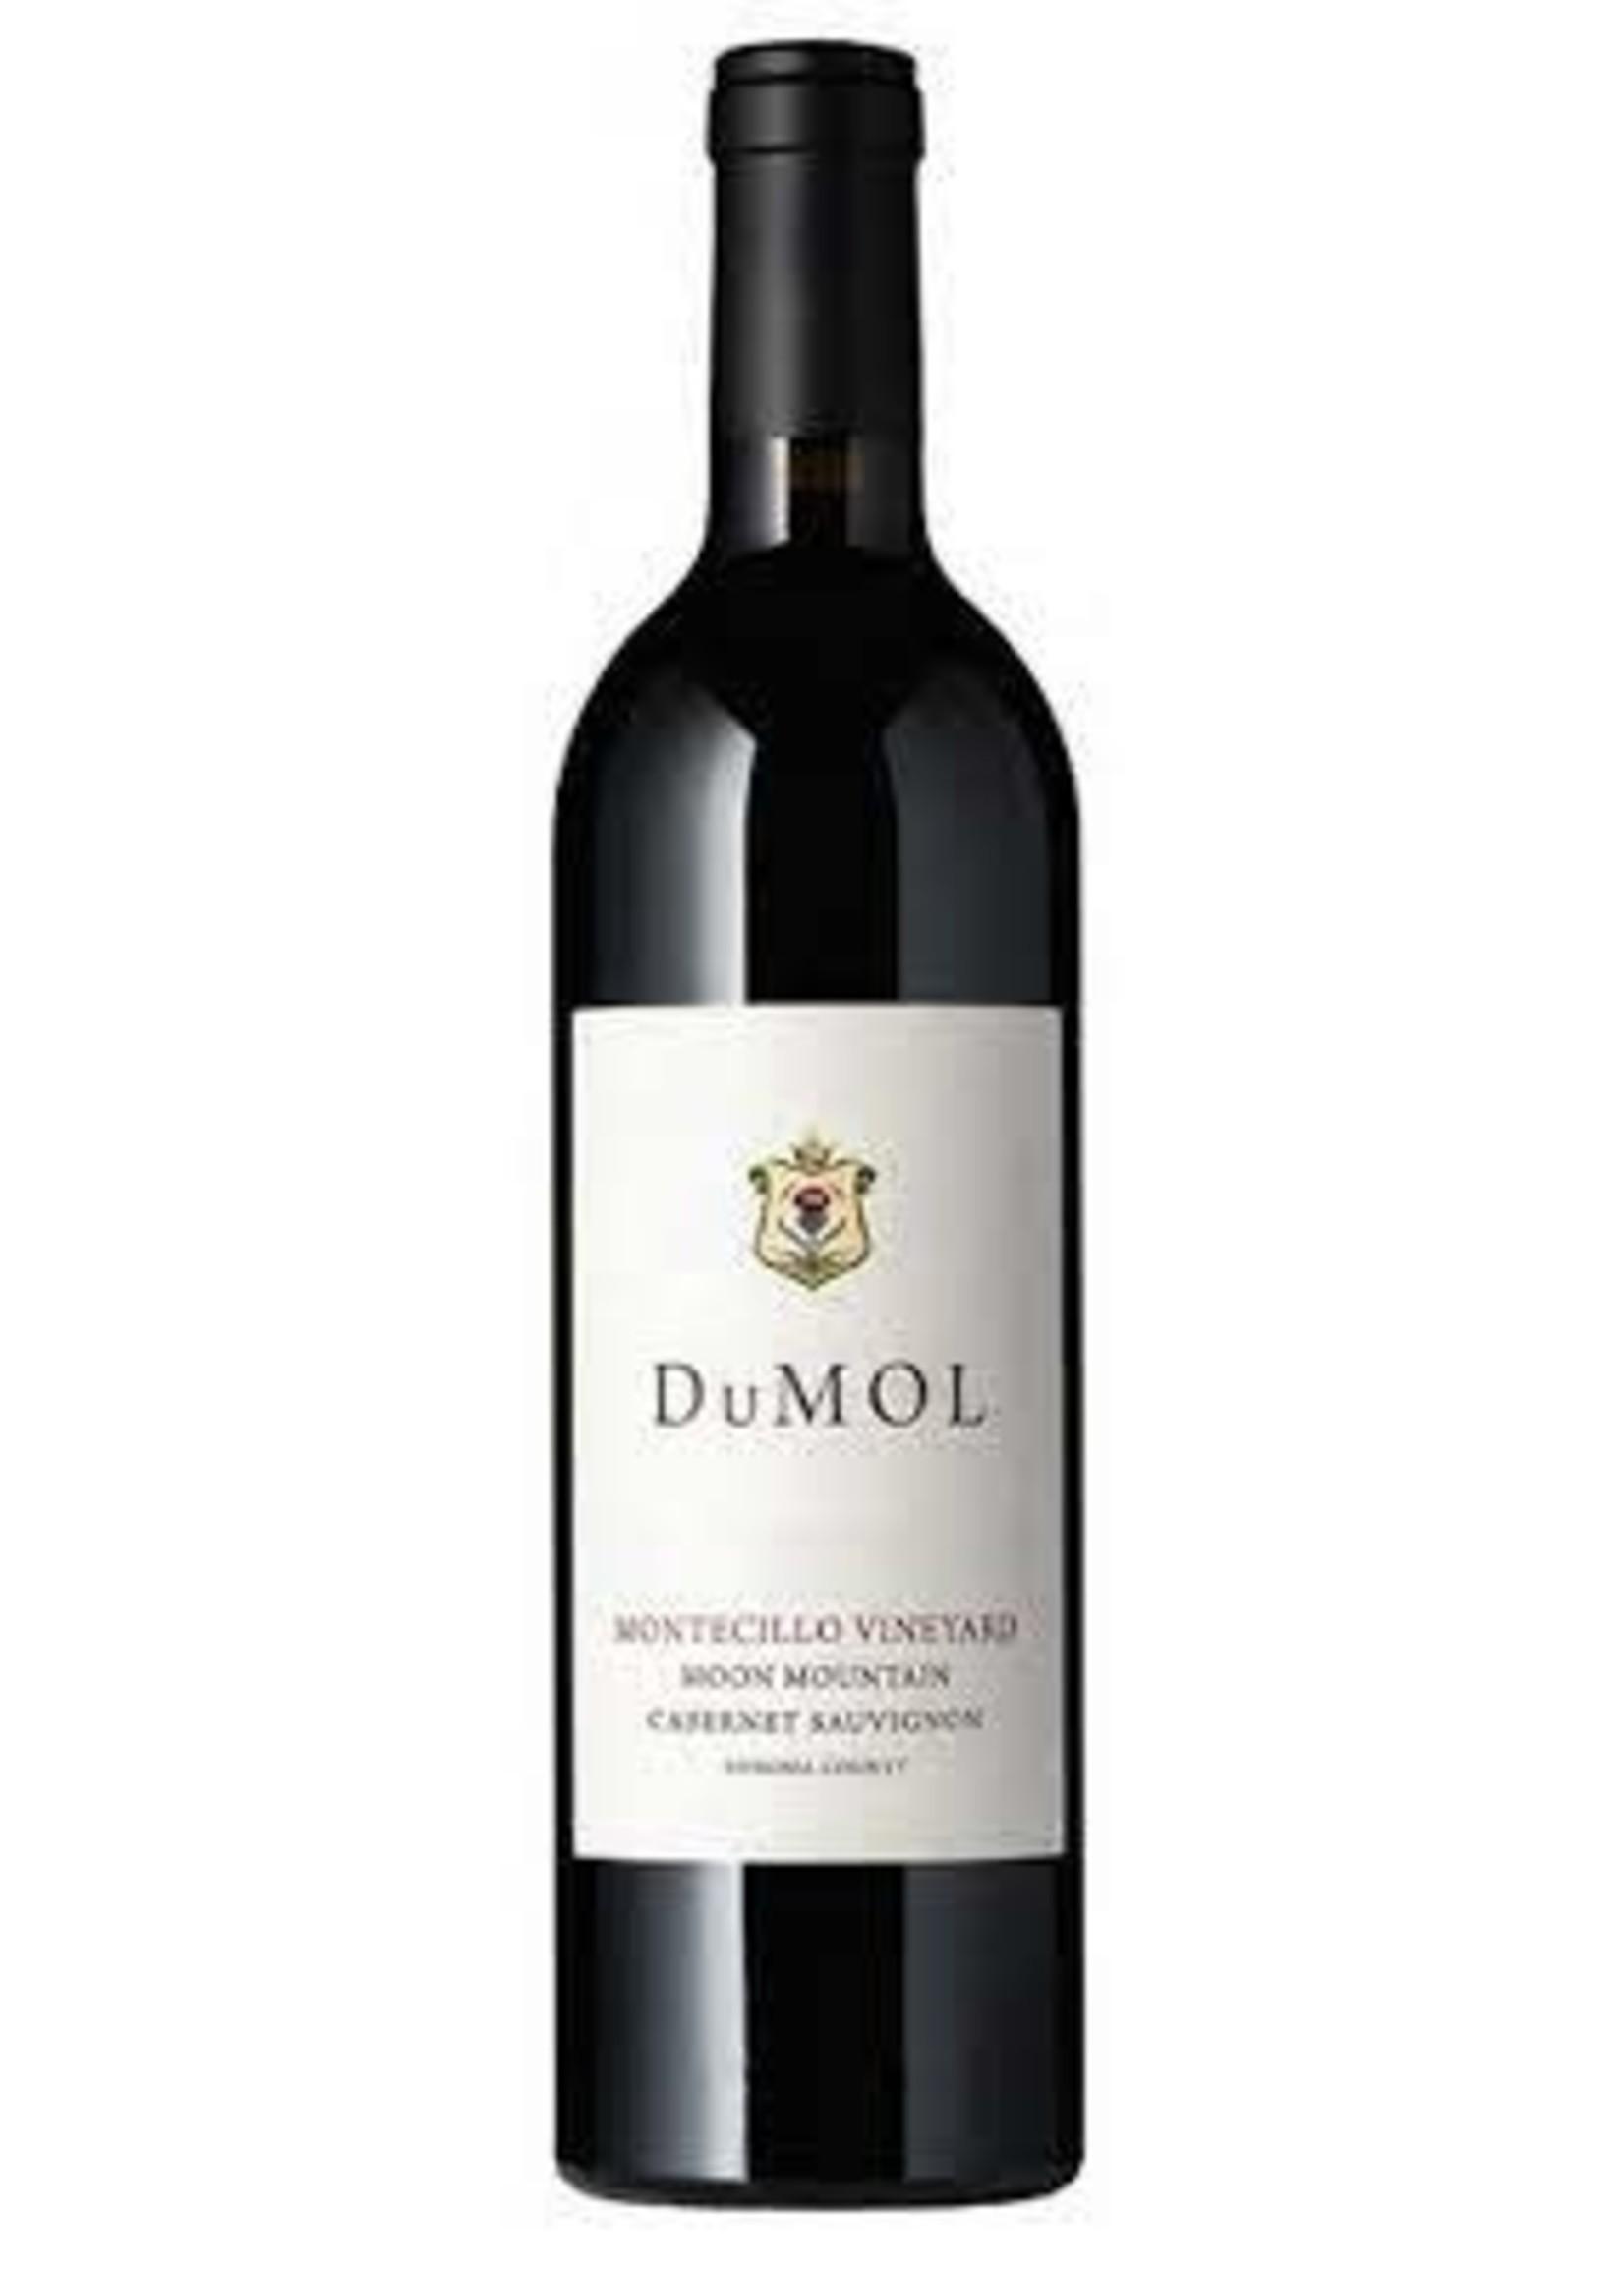 Dumol 2018 Cabernet Sauvignon Montecillo Vyd 750ml